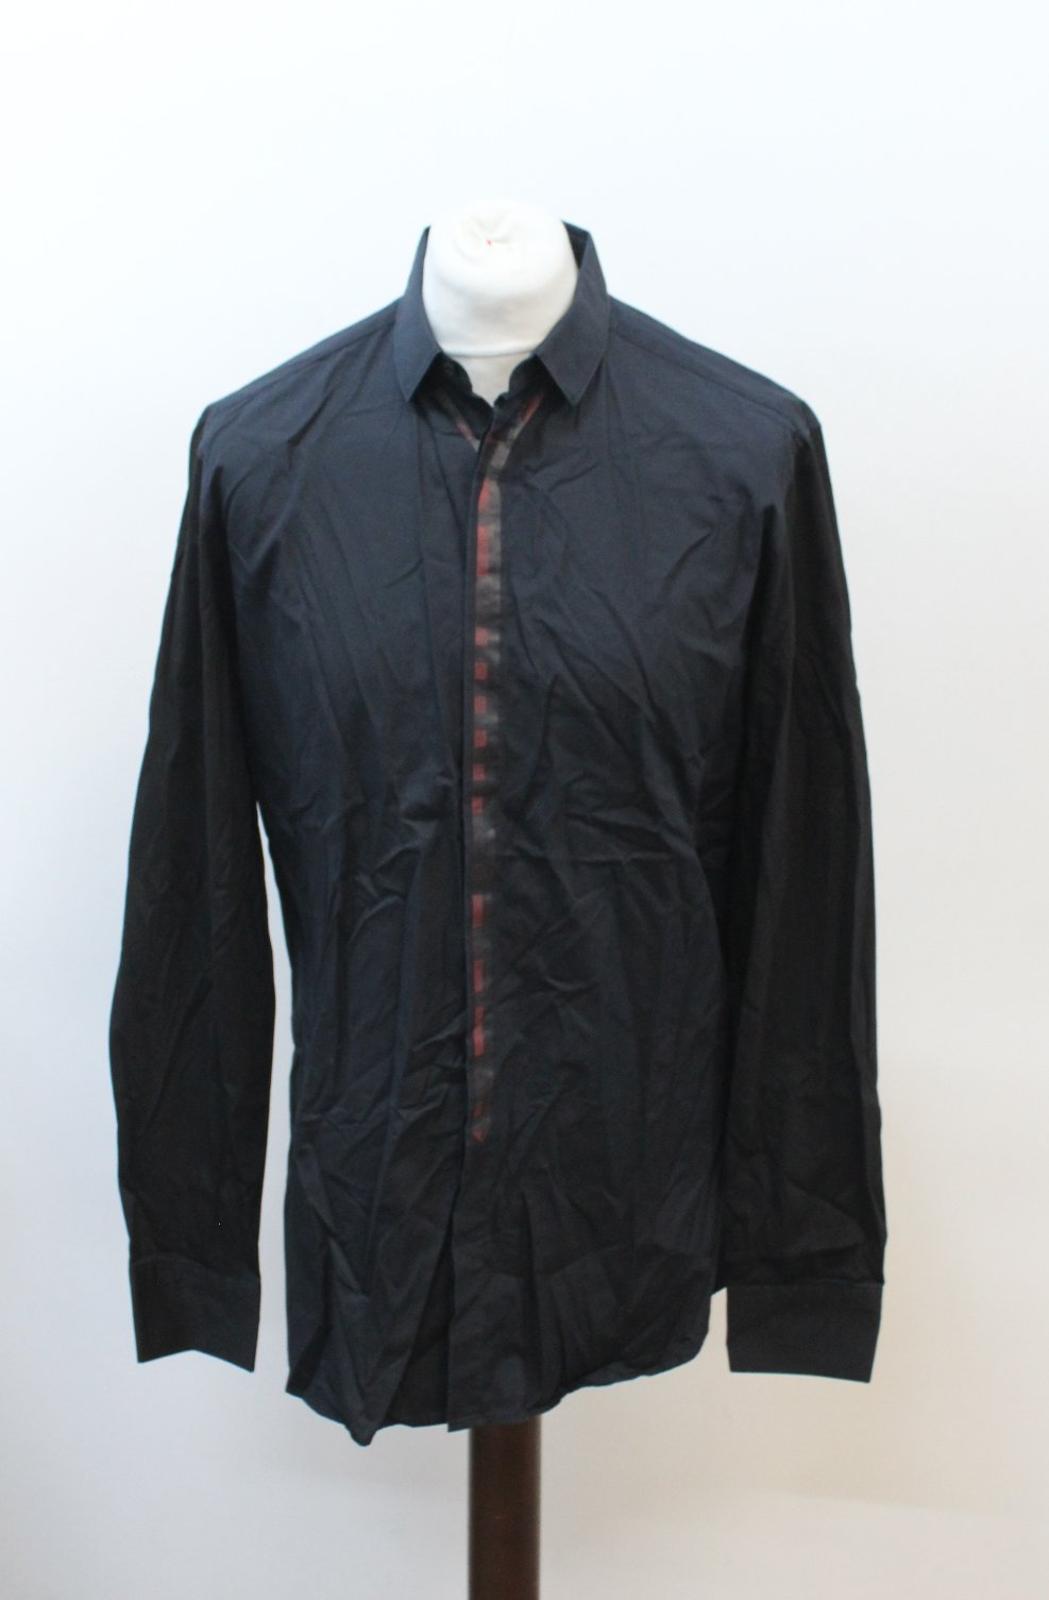 Neil-Barrett-Hombre-Azul-Manga-Negra-Cuello-Camisa-de-impresion-Corbata-Slim-Fit-16-5-034-42cm miniatura 7